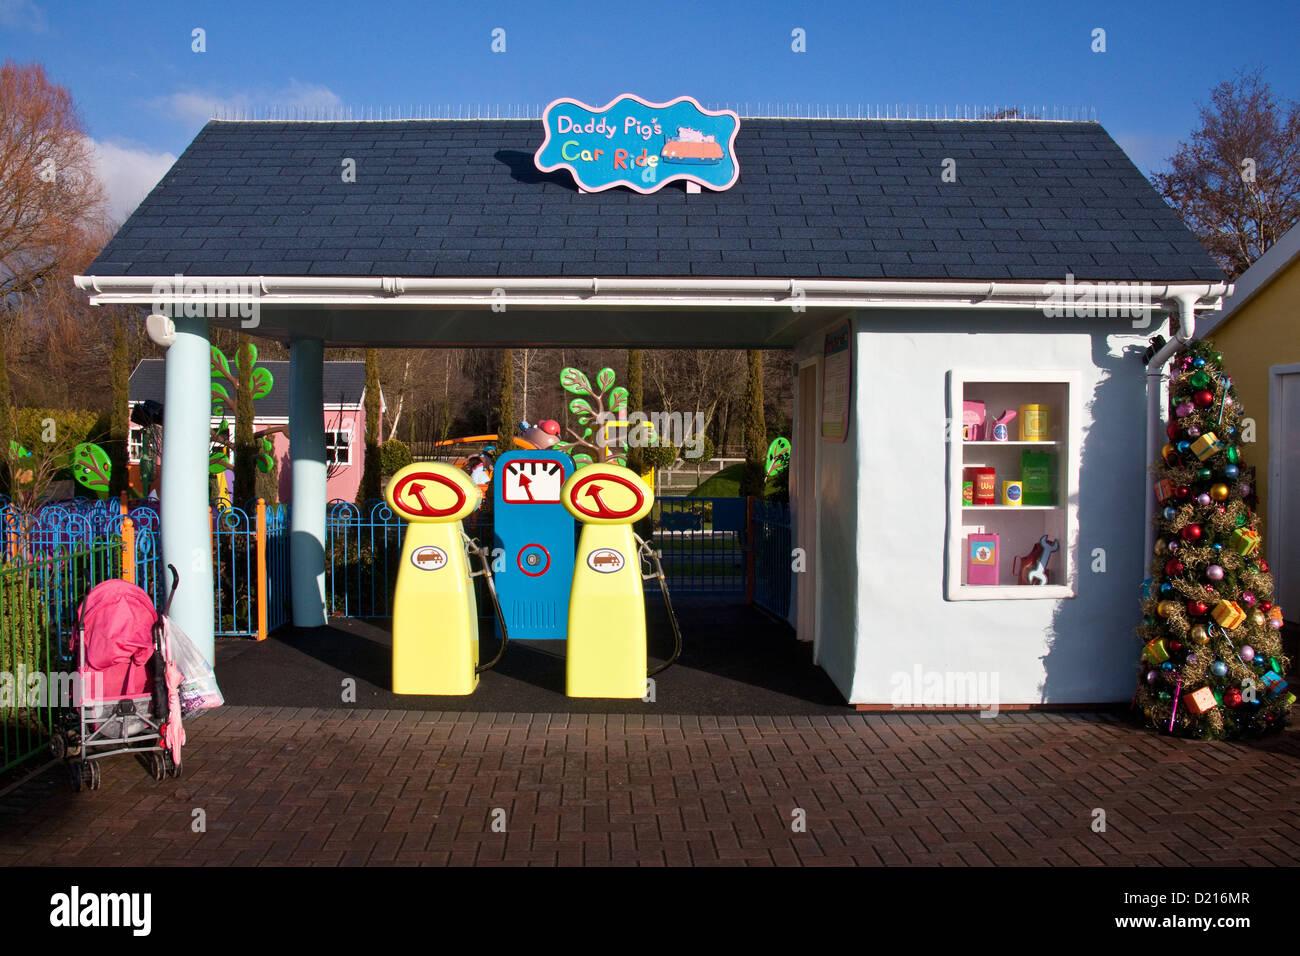 Daddy Pig's Car Ride, Peppa Pig world, Paultons Park, Southampton